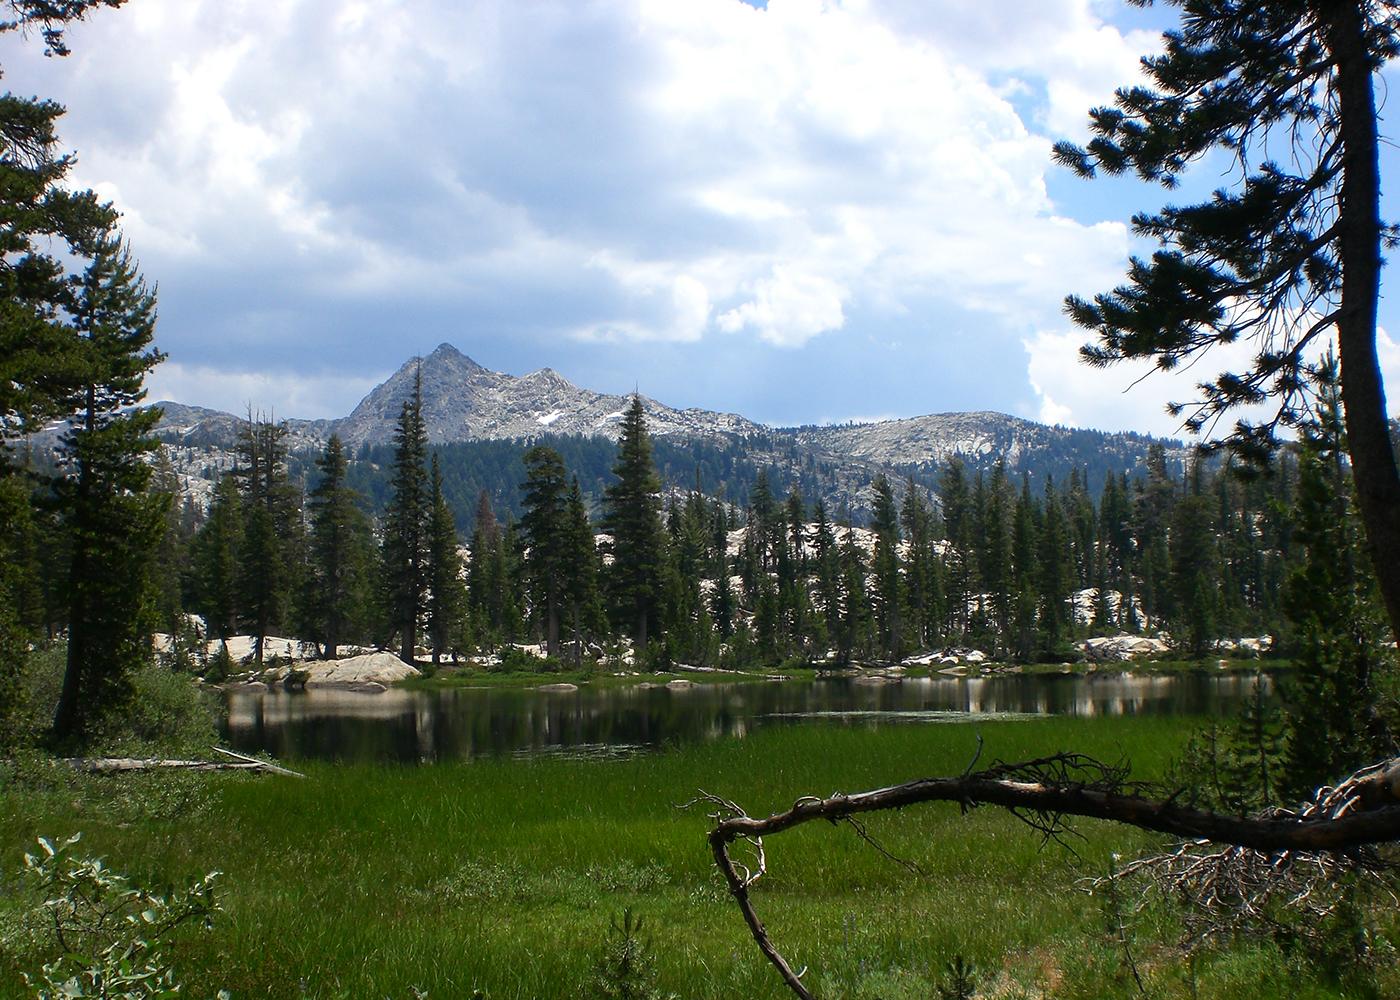 Hiking The Emigrant Wilderness And Northern Yosemite